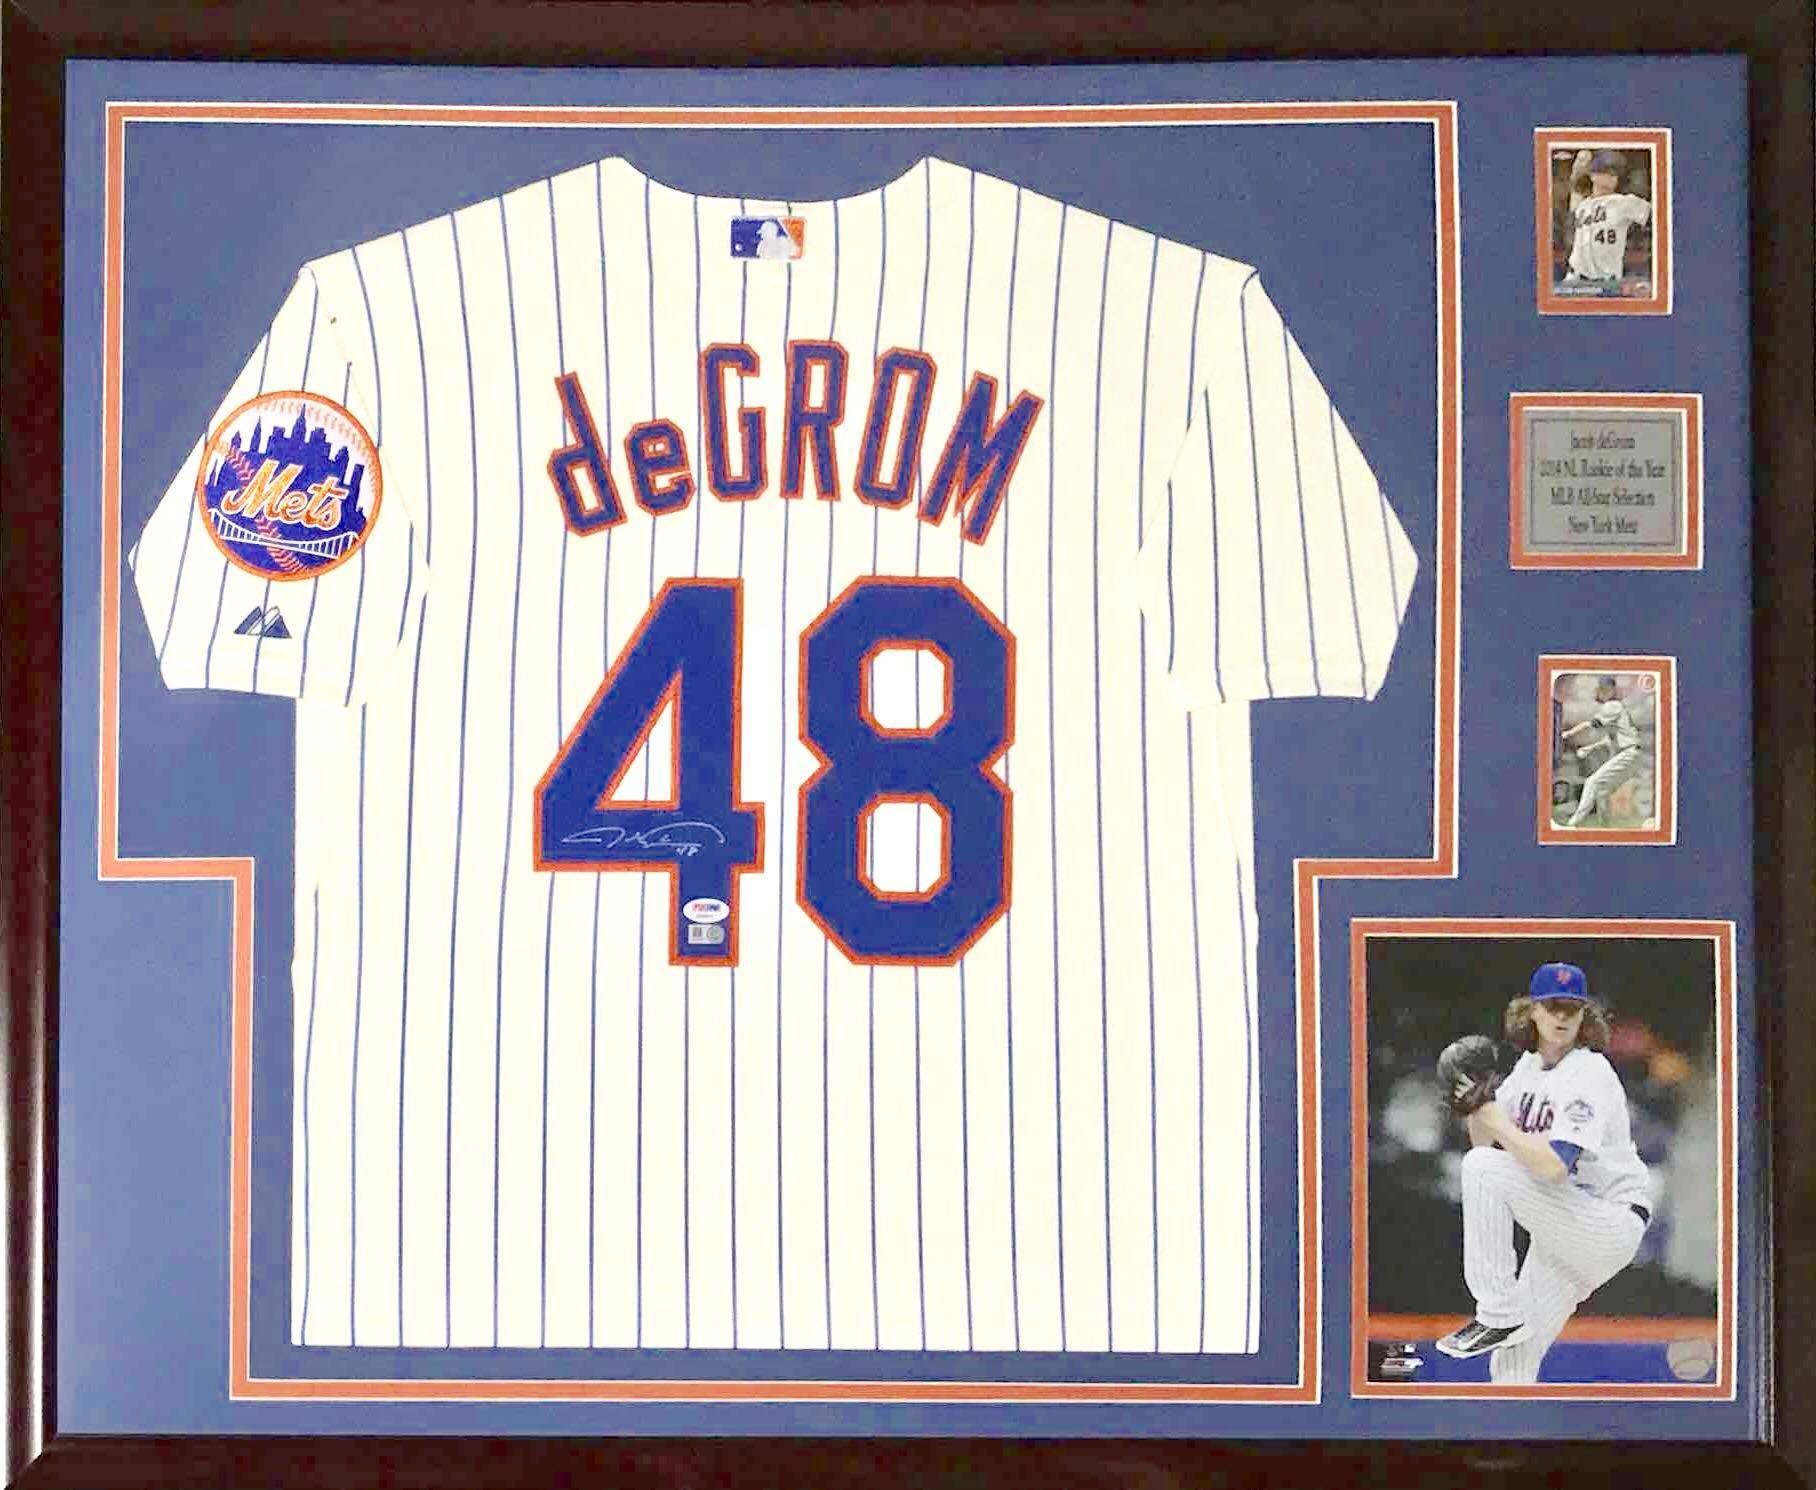 #jacobdeGrom #Mets framed jersey #jerseyframing #framedjersey